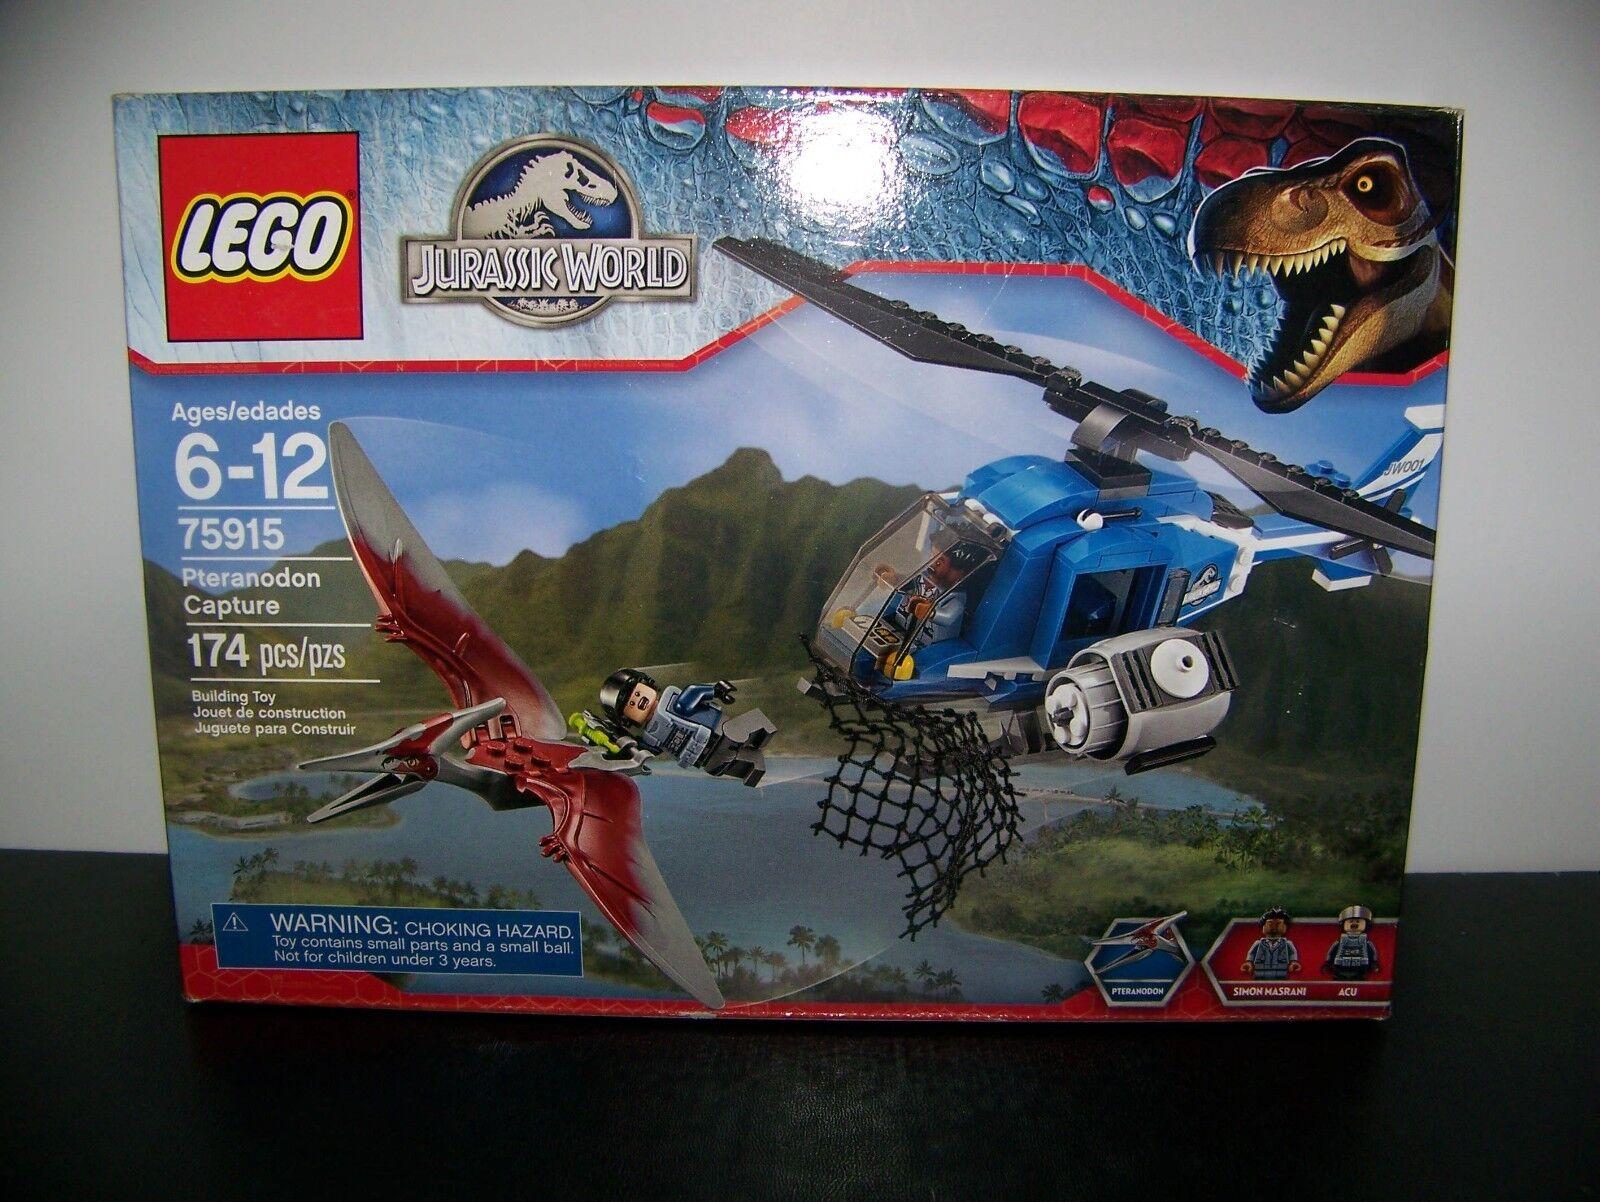 Lego Jurassic  World Pteranodon Capture 75915 2015 BRAND nouveau  limite acheter